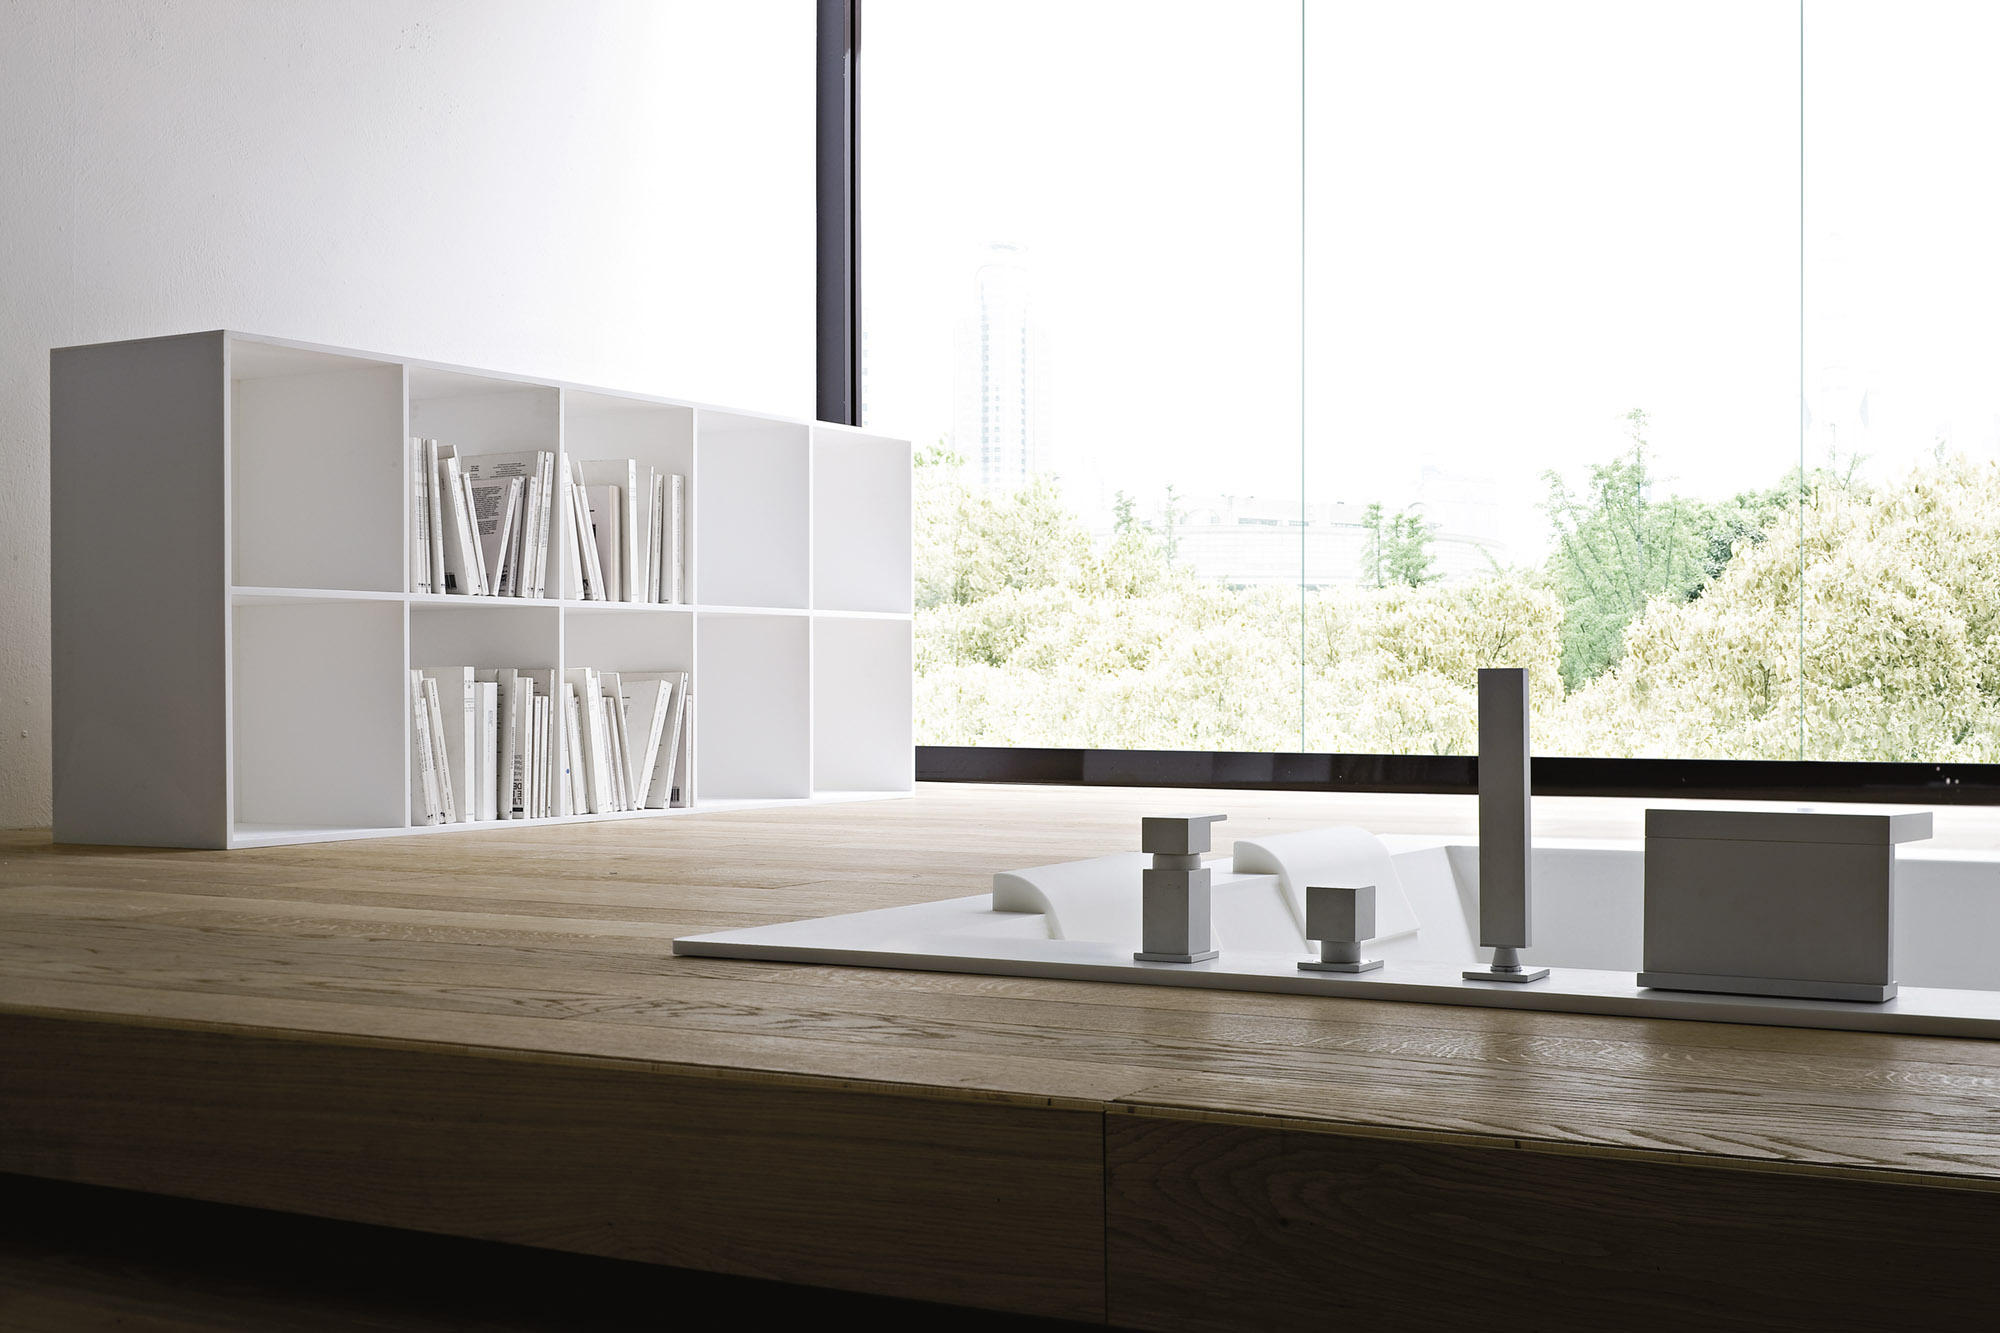 Unico maxi icasso vasche ad incasso rexa design architonic - Vasche da bagno ad incasso ...